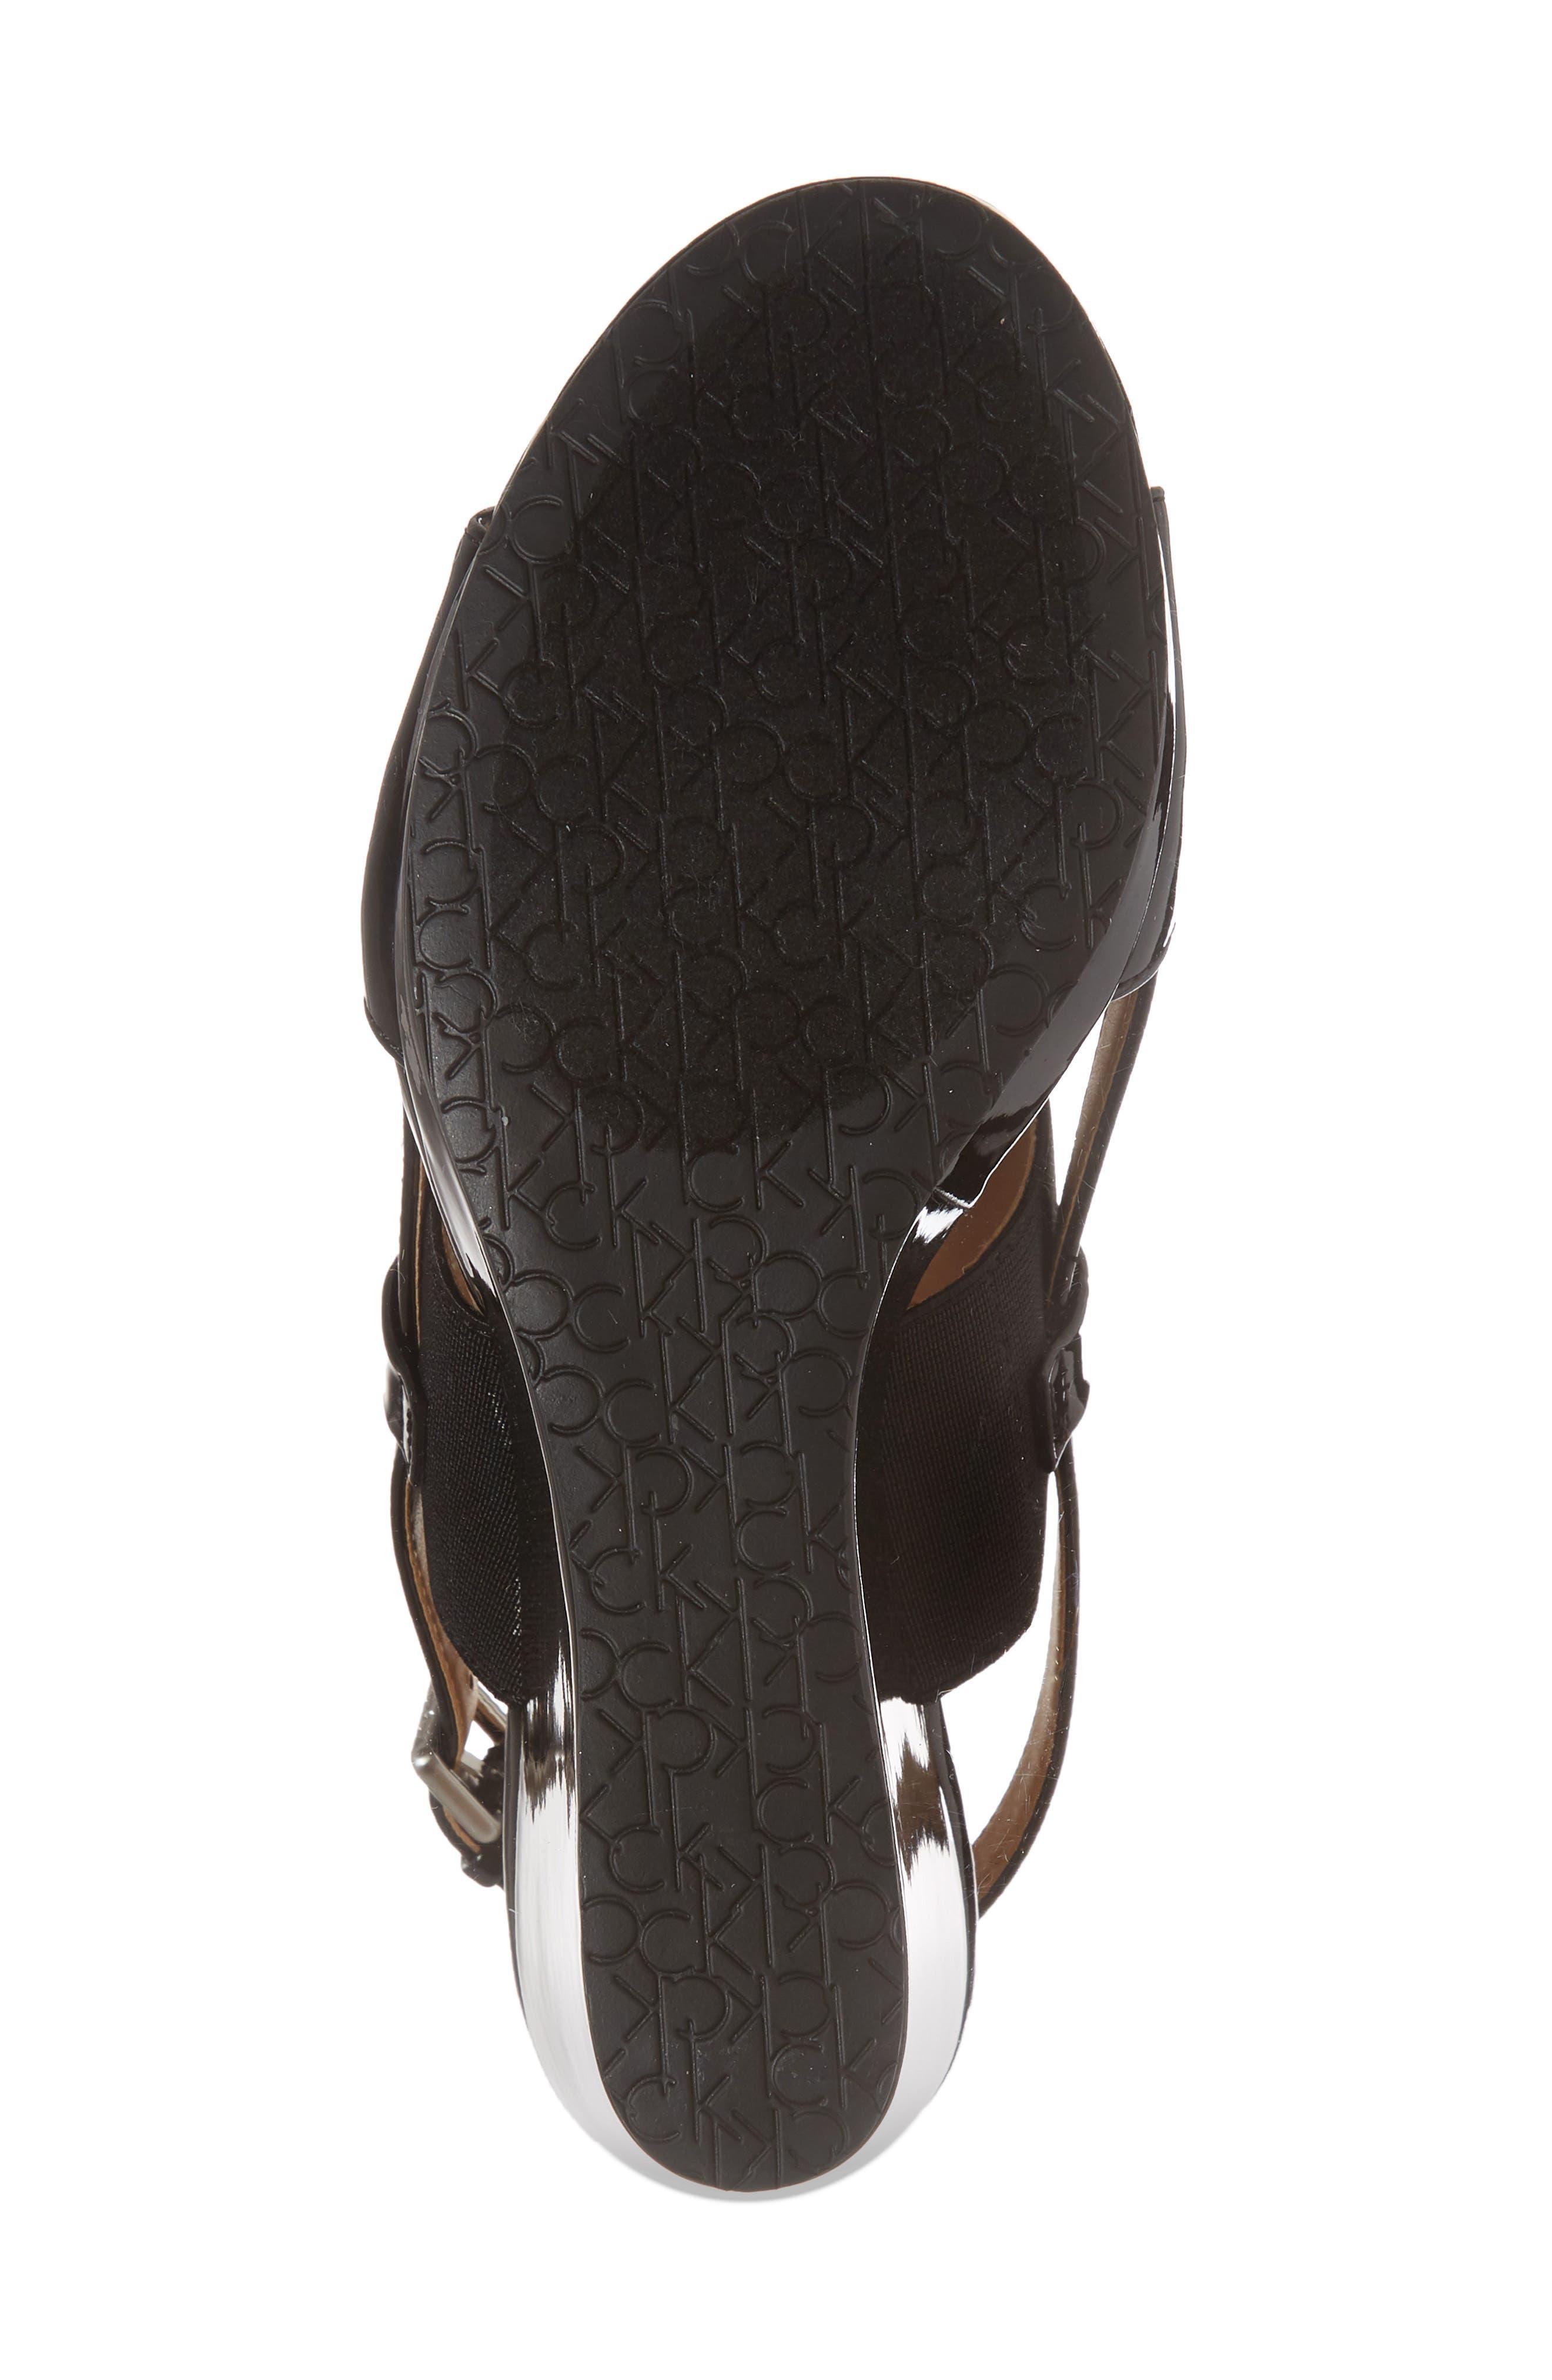 Bethan Wedge Sandal,                             Alternate thumbnail 6, color,                             Black Patent